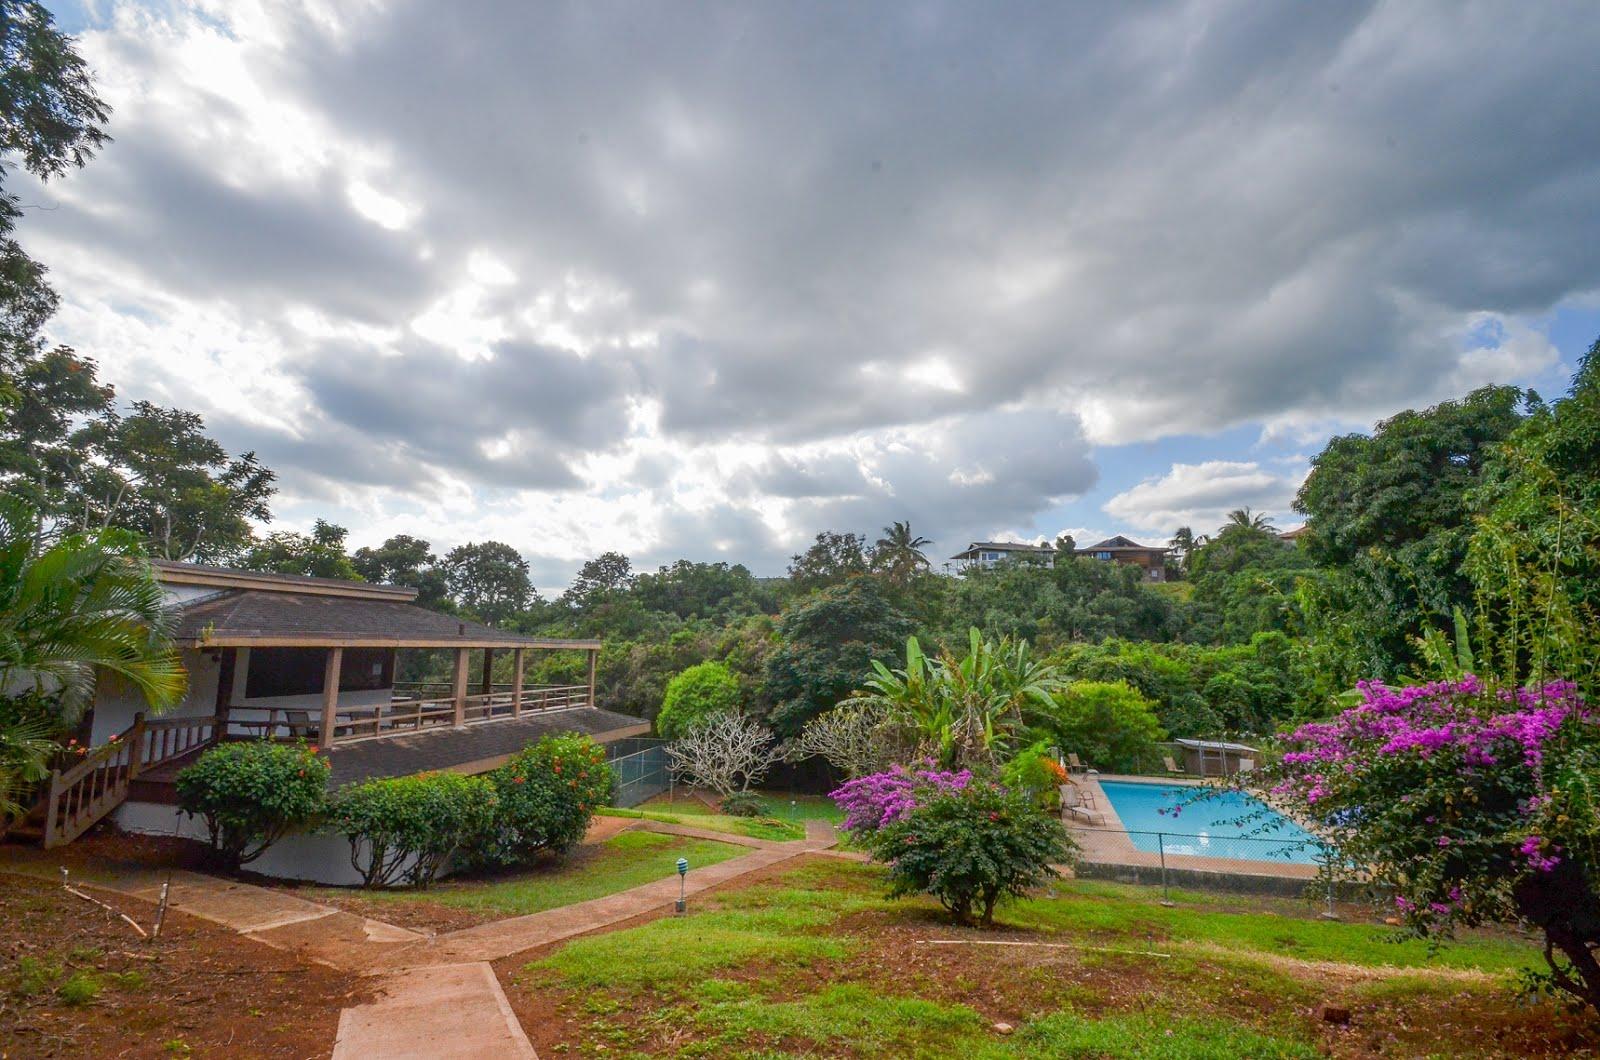 kauai real estate for sale kauai condos for sale under